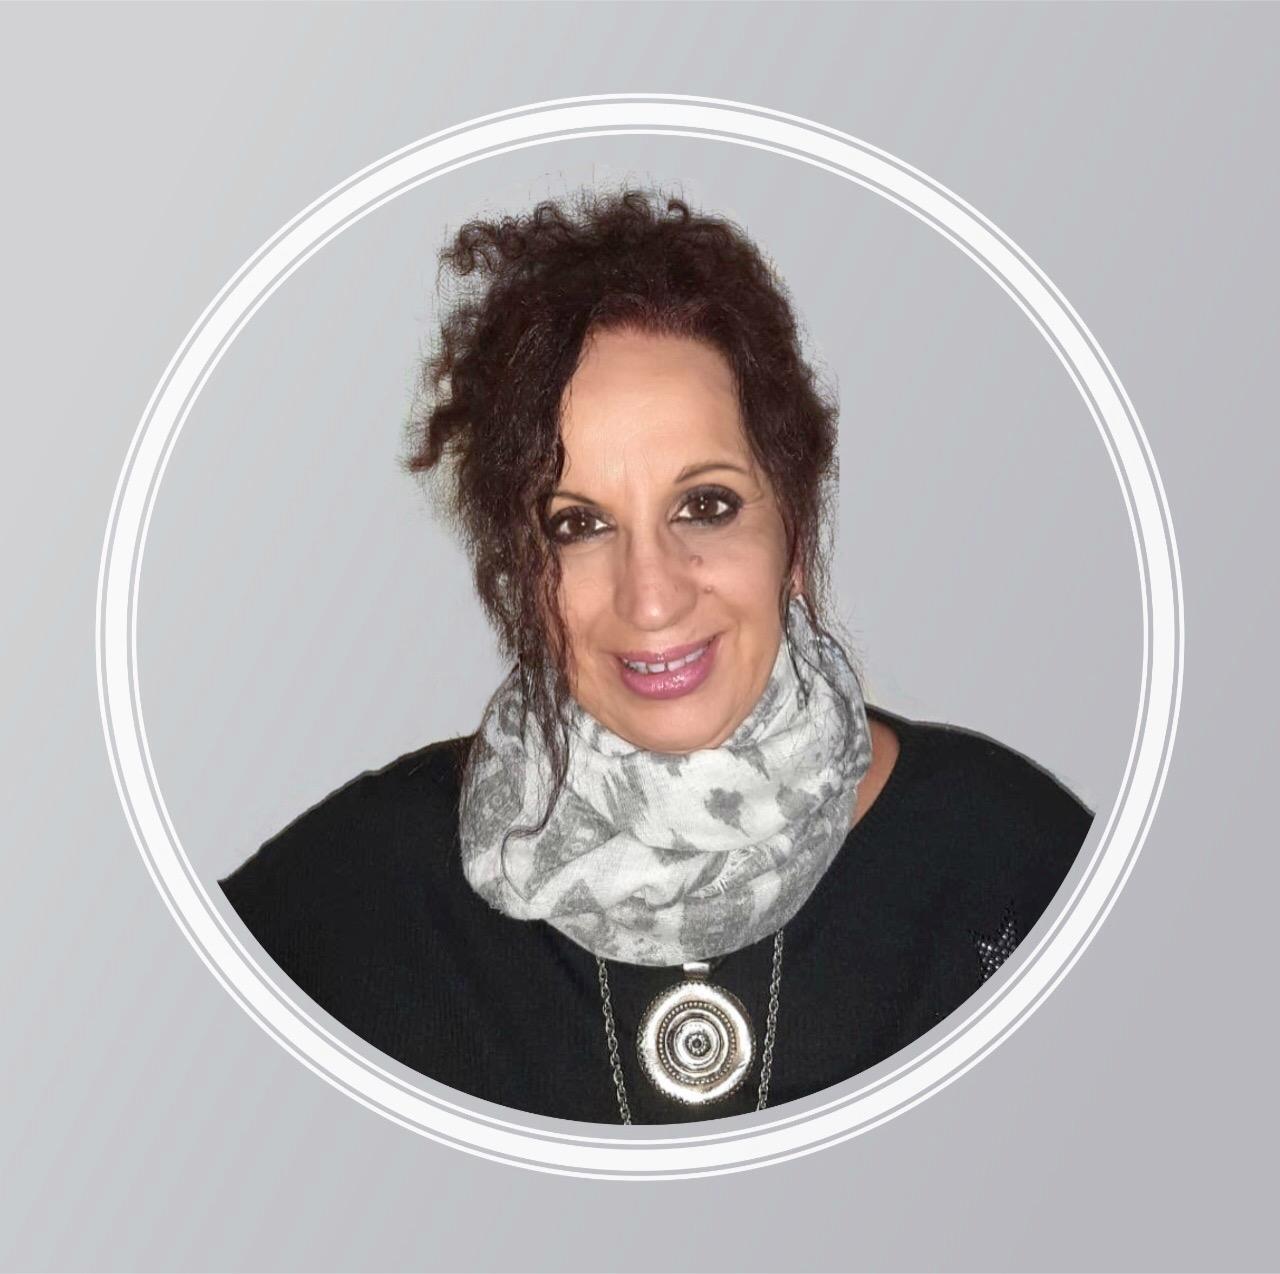 Marisa Inés Labanca